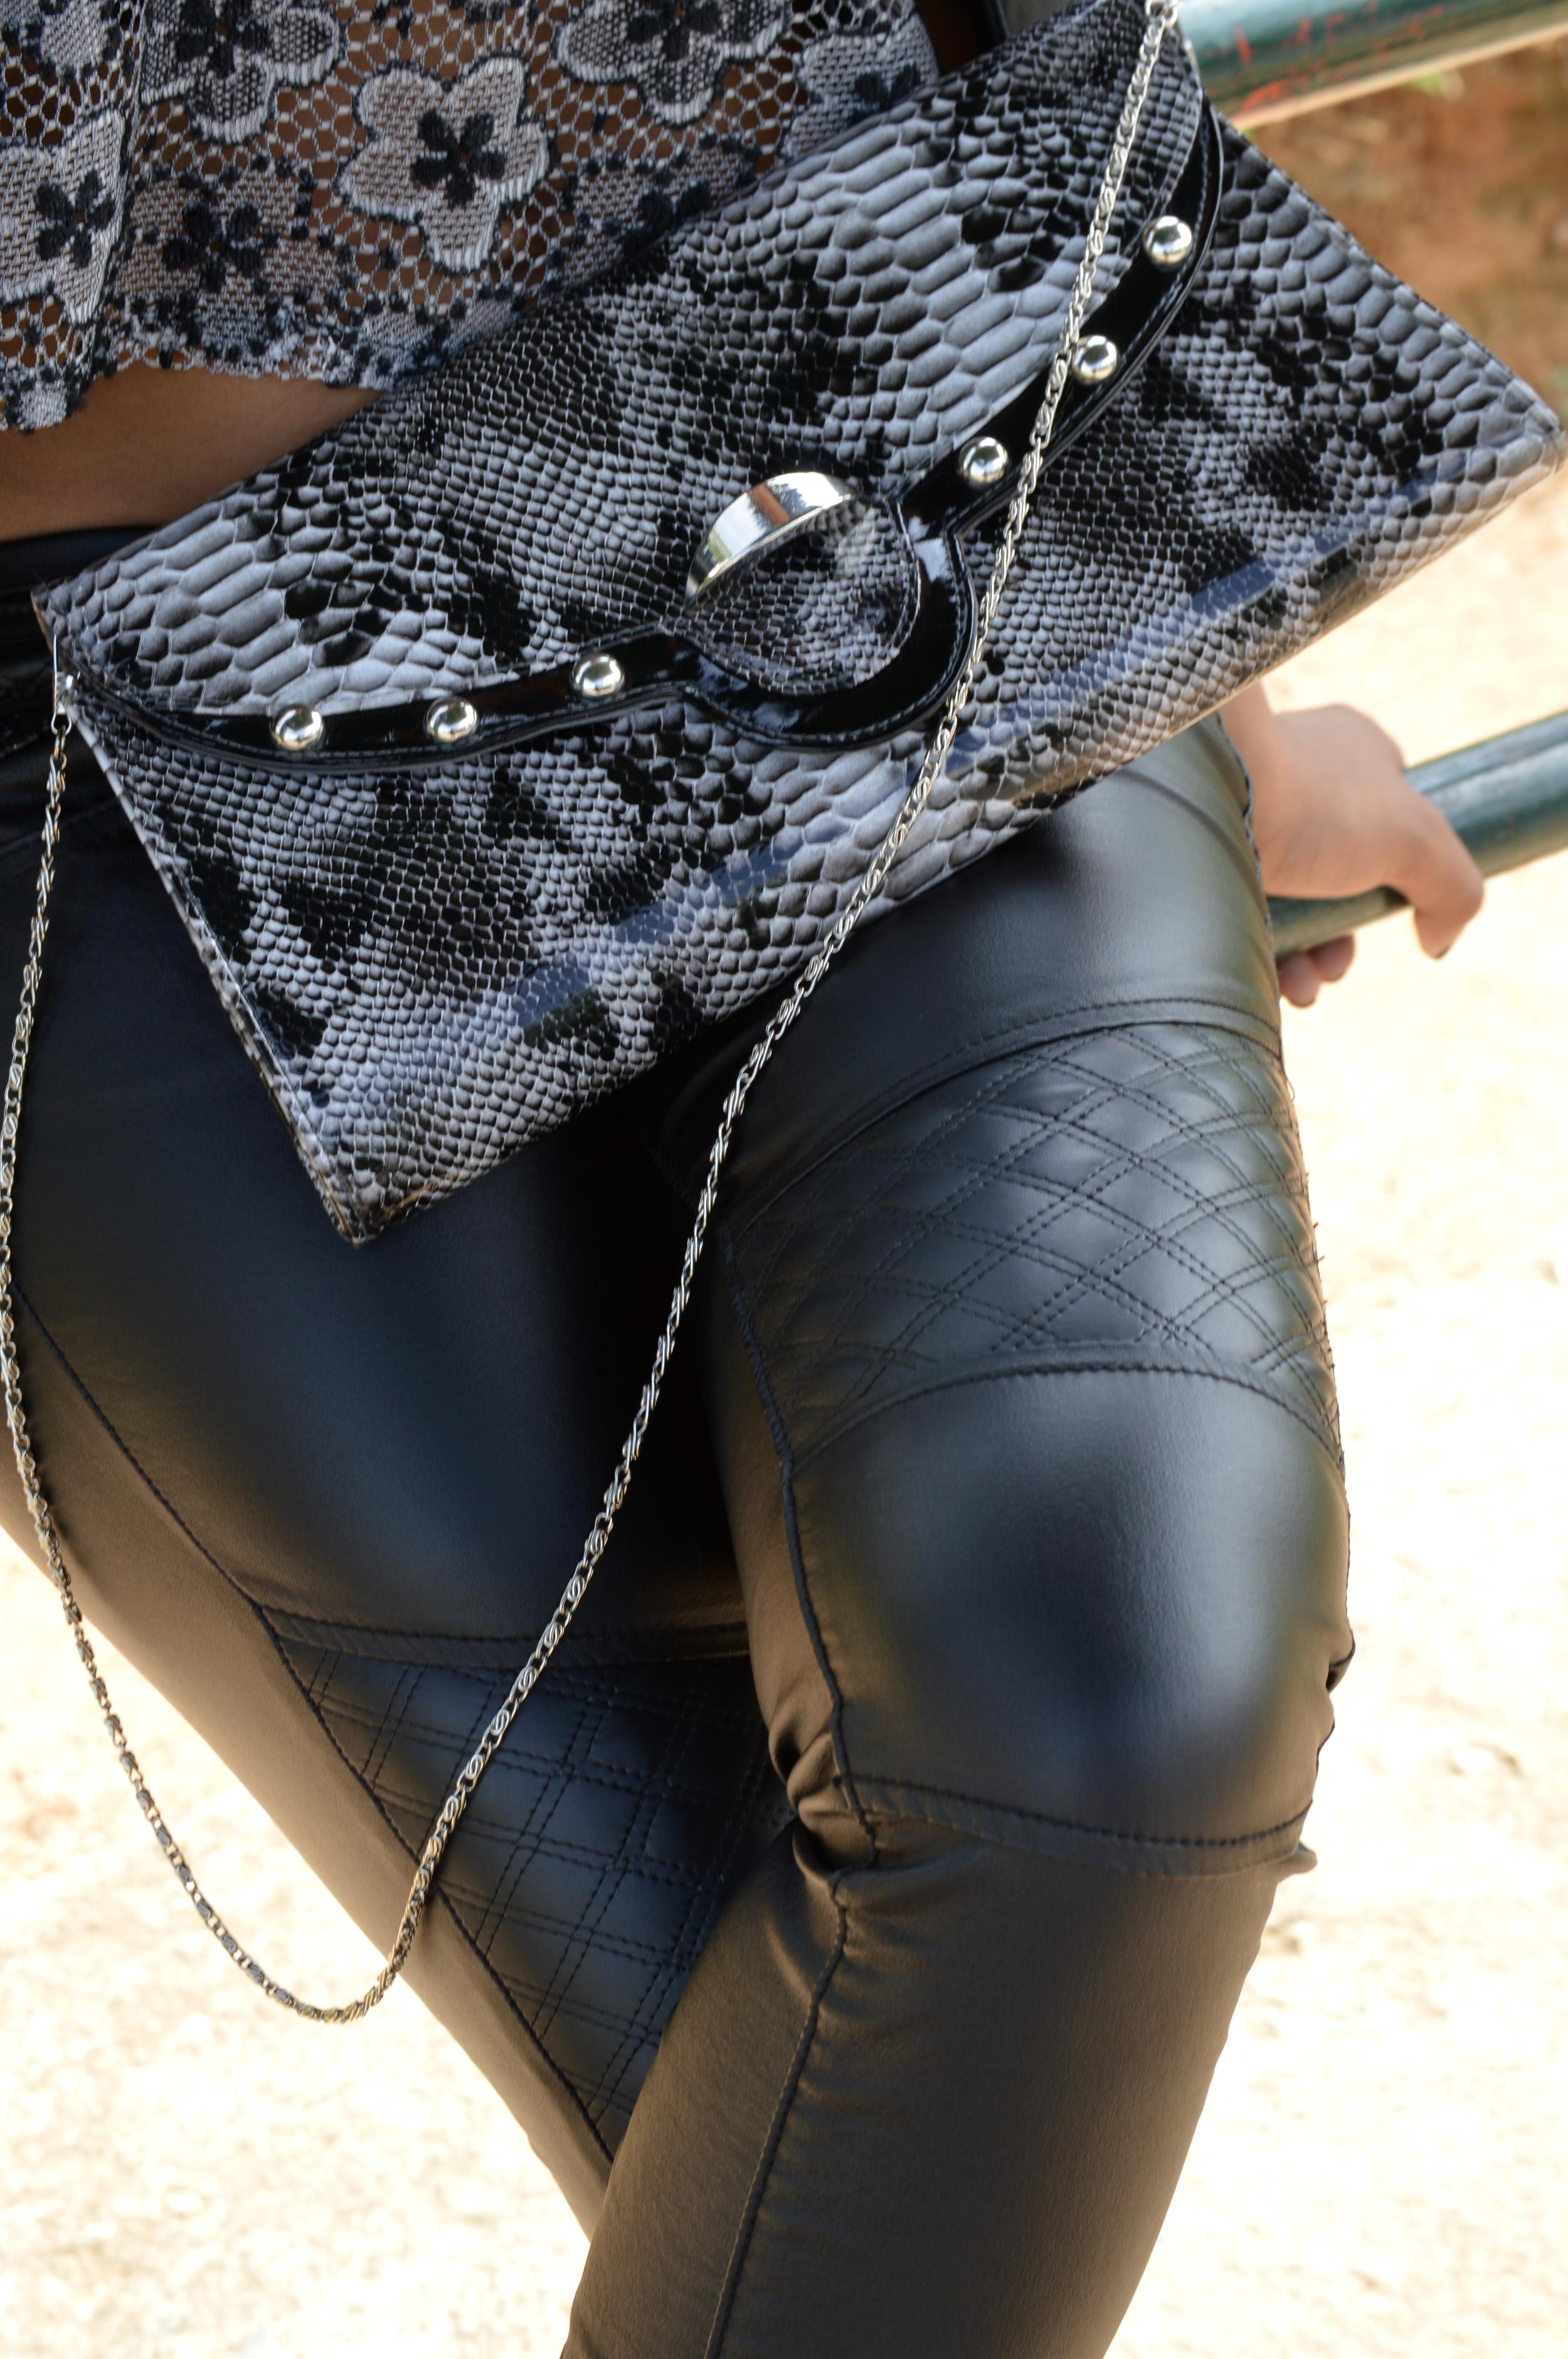 Kaylista_leather3